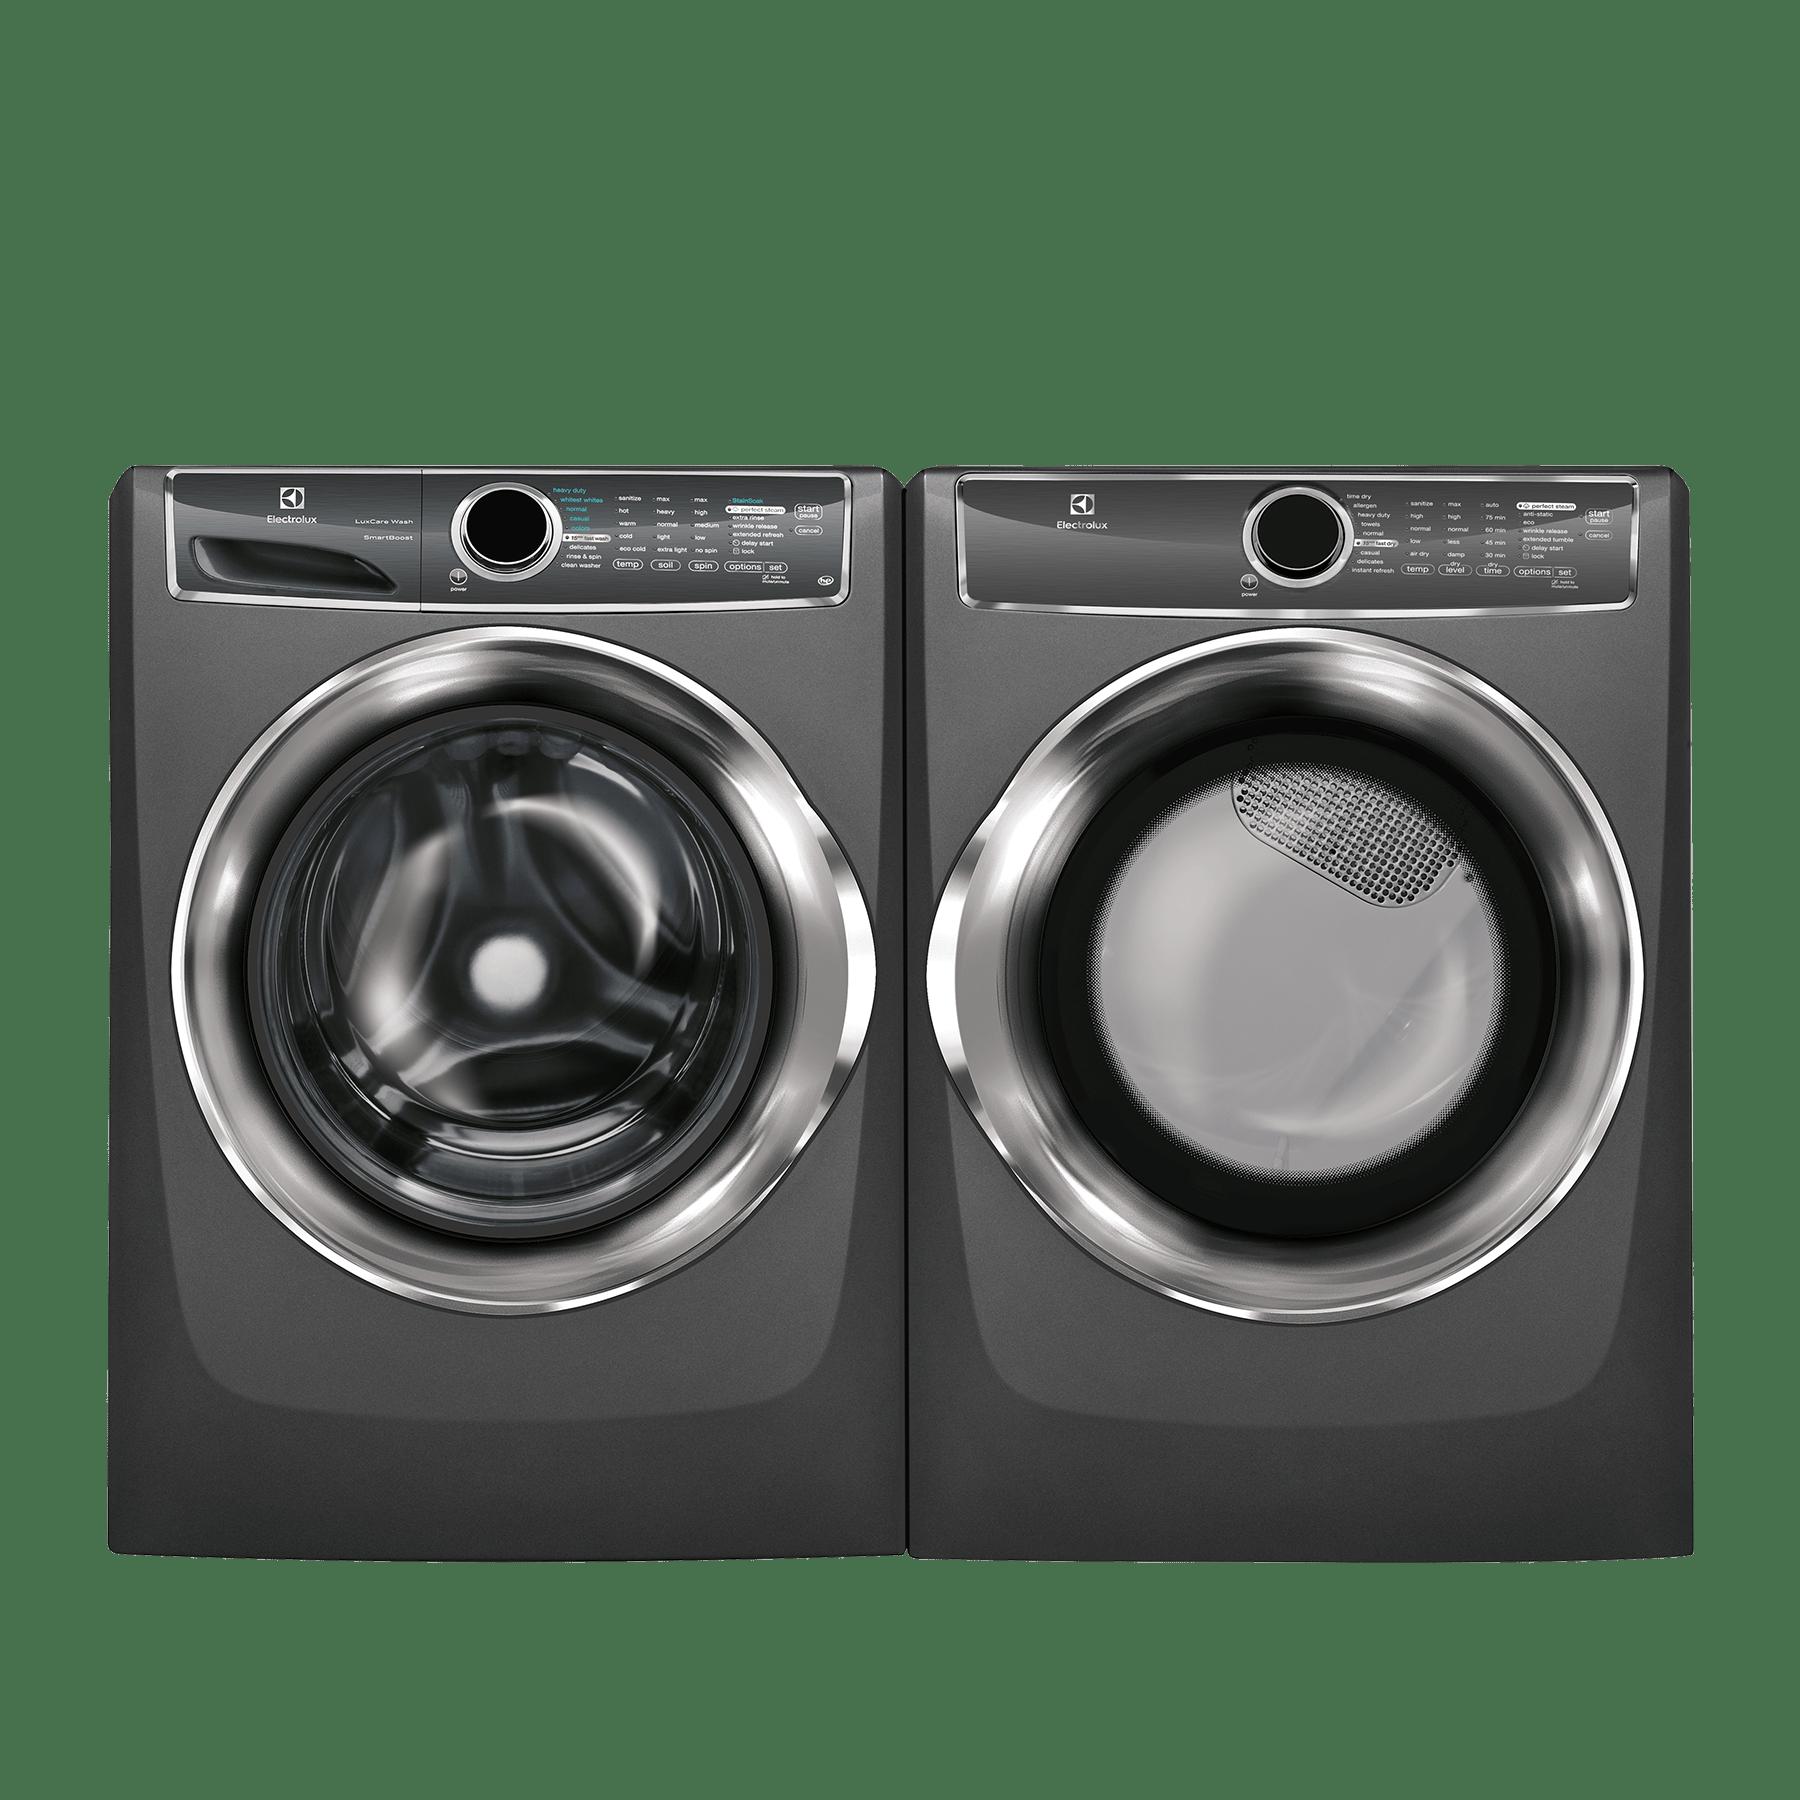 Laundry Pairs Tee Vax Home Appliance Kitchen Center Frigidaire Electricdryer 5995298980 Parts Electrolux Front Load Pair Titanium Ellauefme617stt